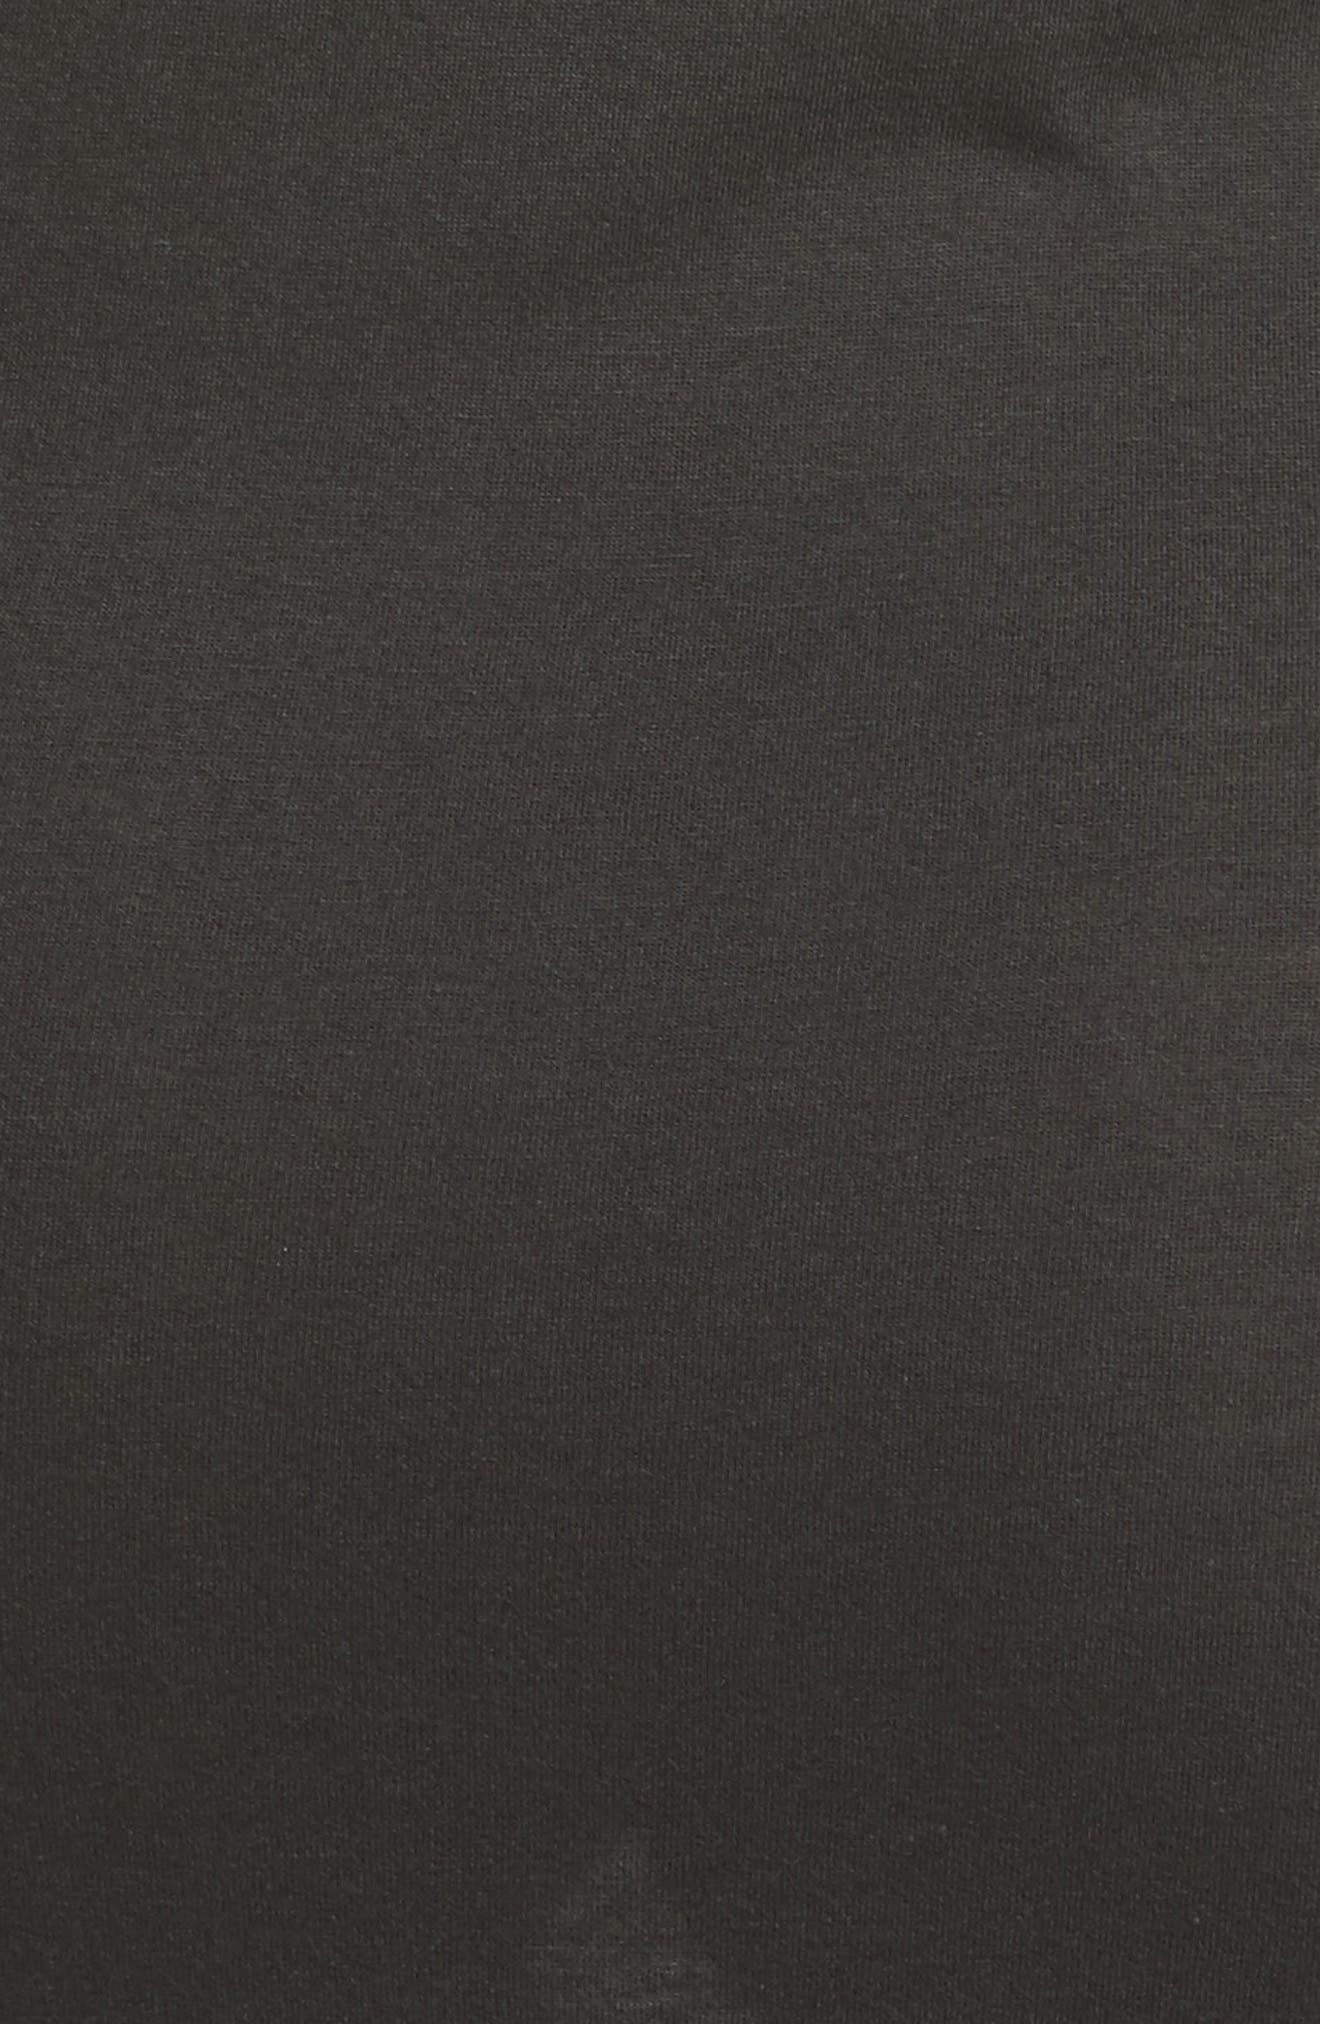 Sameetha Plume Jersey Maxi Dress,                             Alternate thumbnail 5, color,                             001